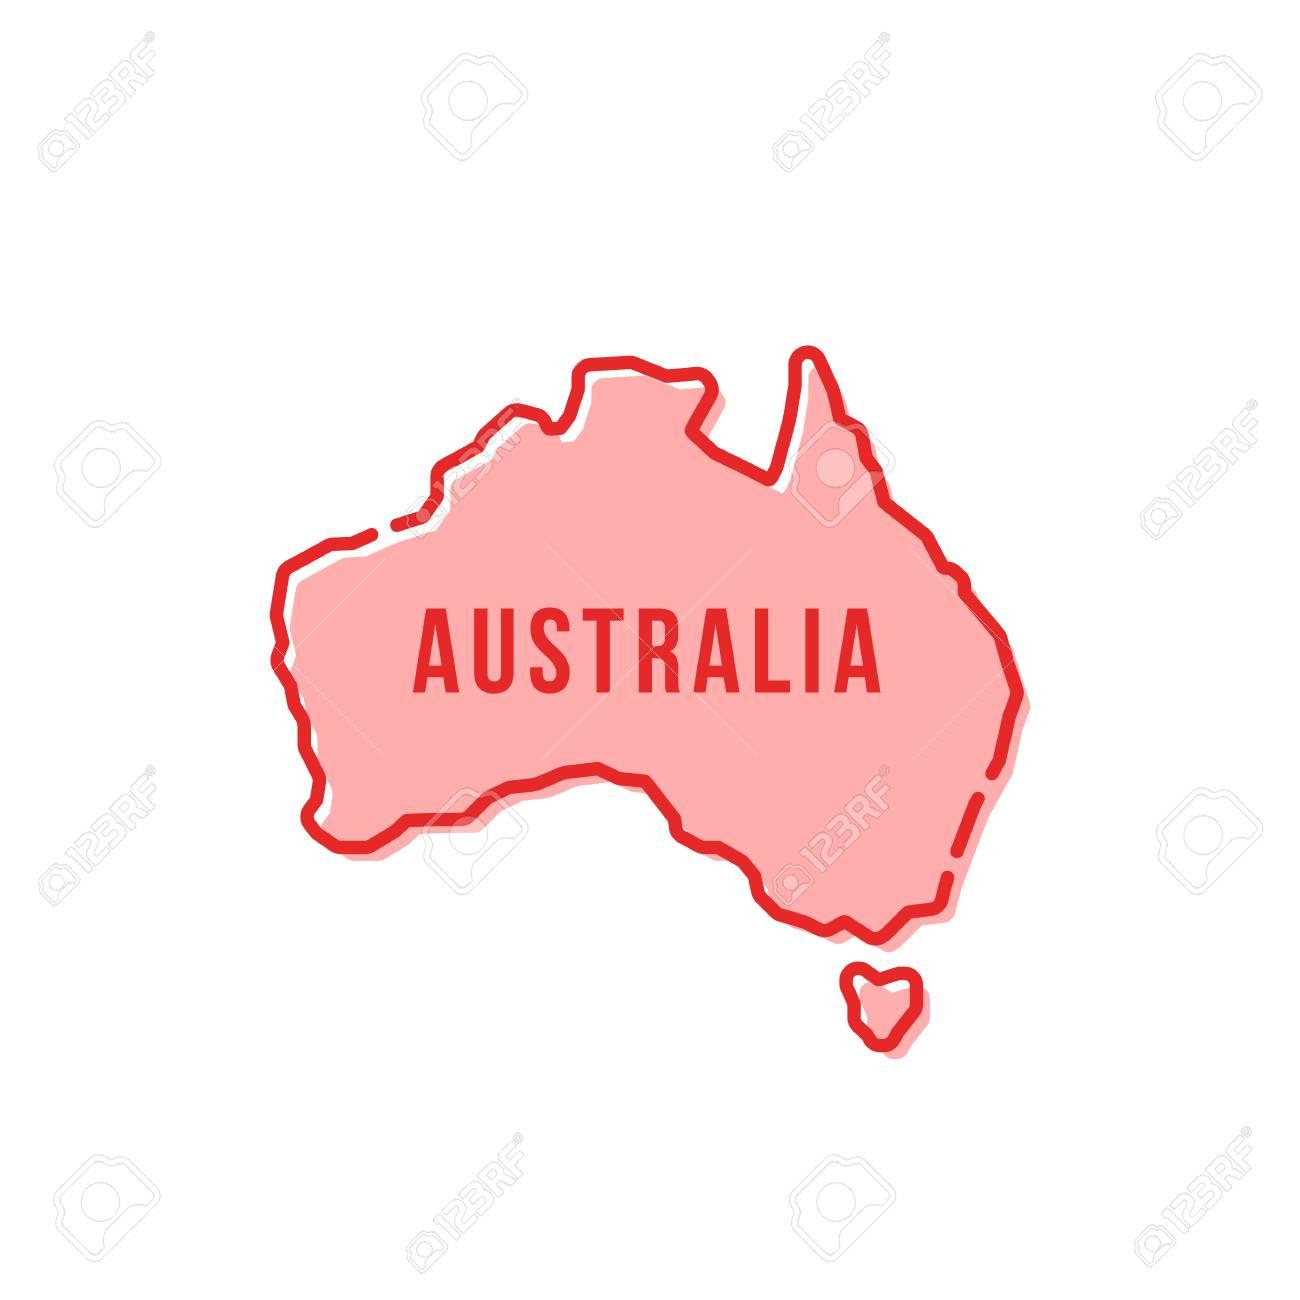 Australia Map Icon.Red Simple Thin Line Australia Cartoon Map Icon